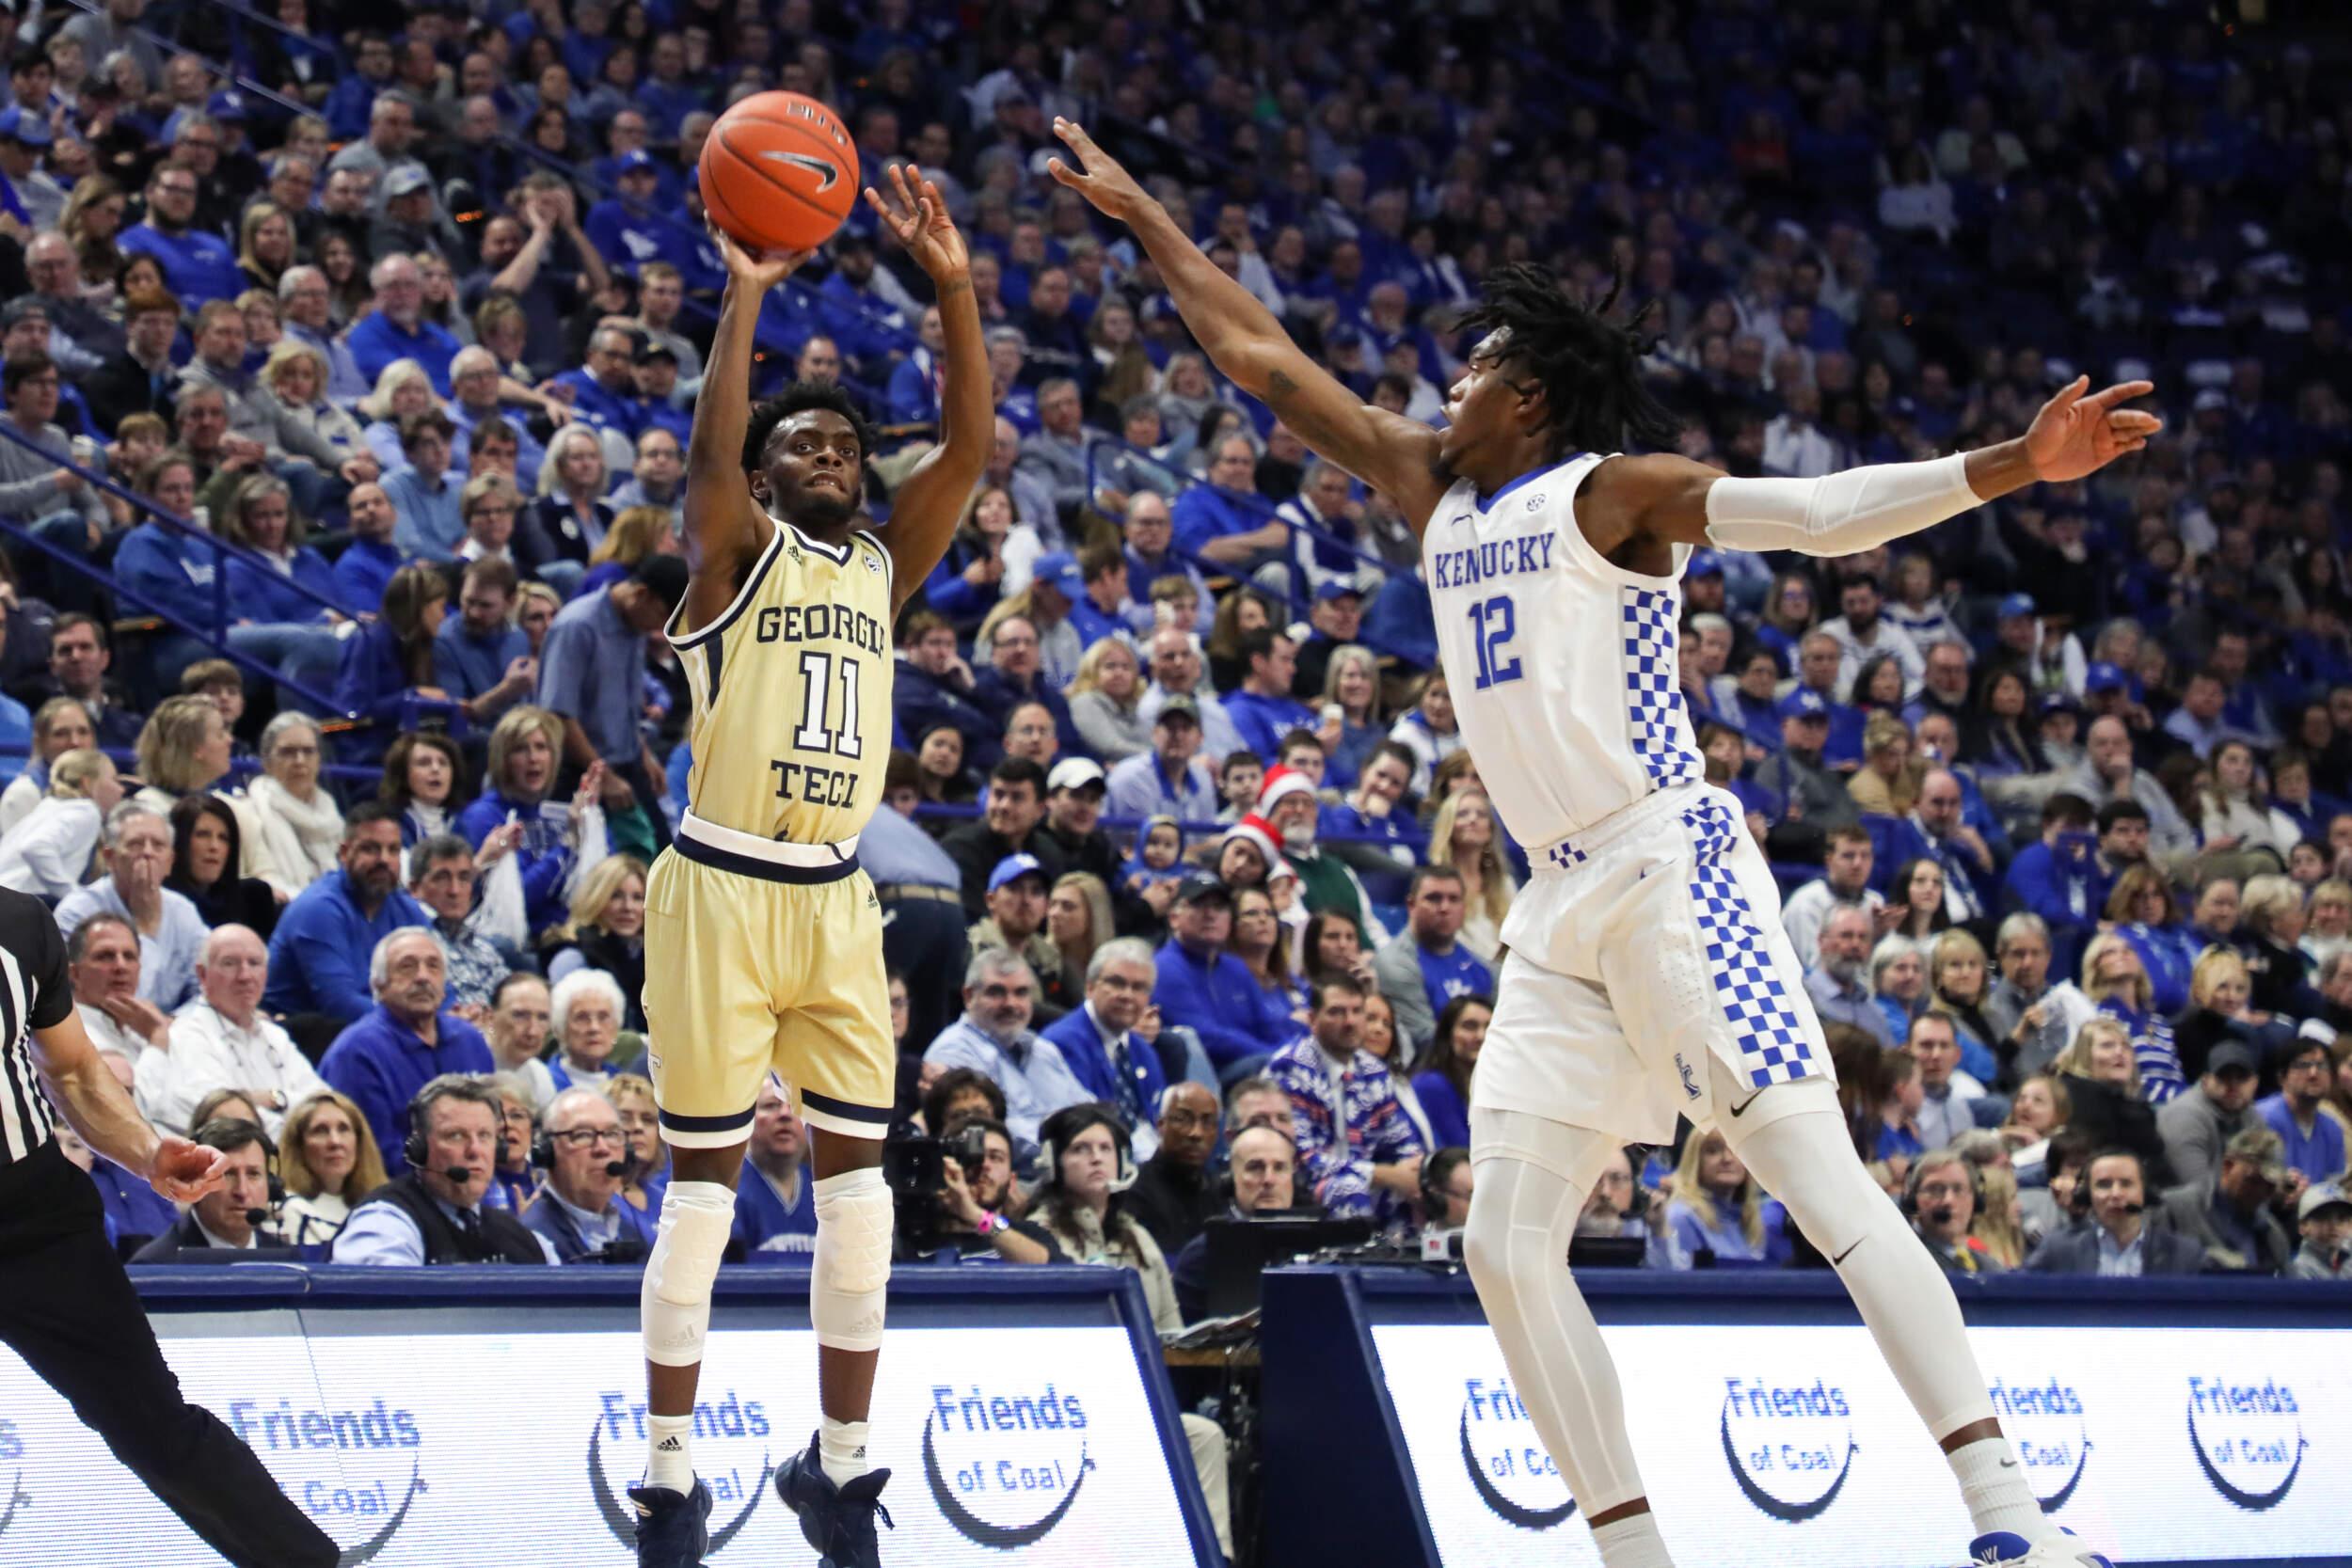 Hagans Scores 21, Leads Kentucky Past Ga. Tech 67-53